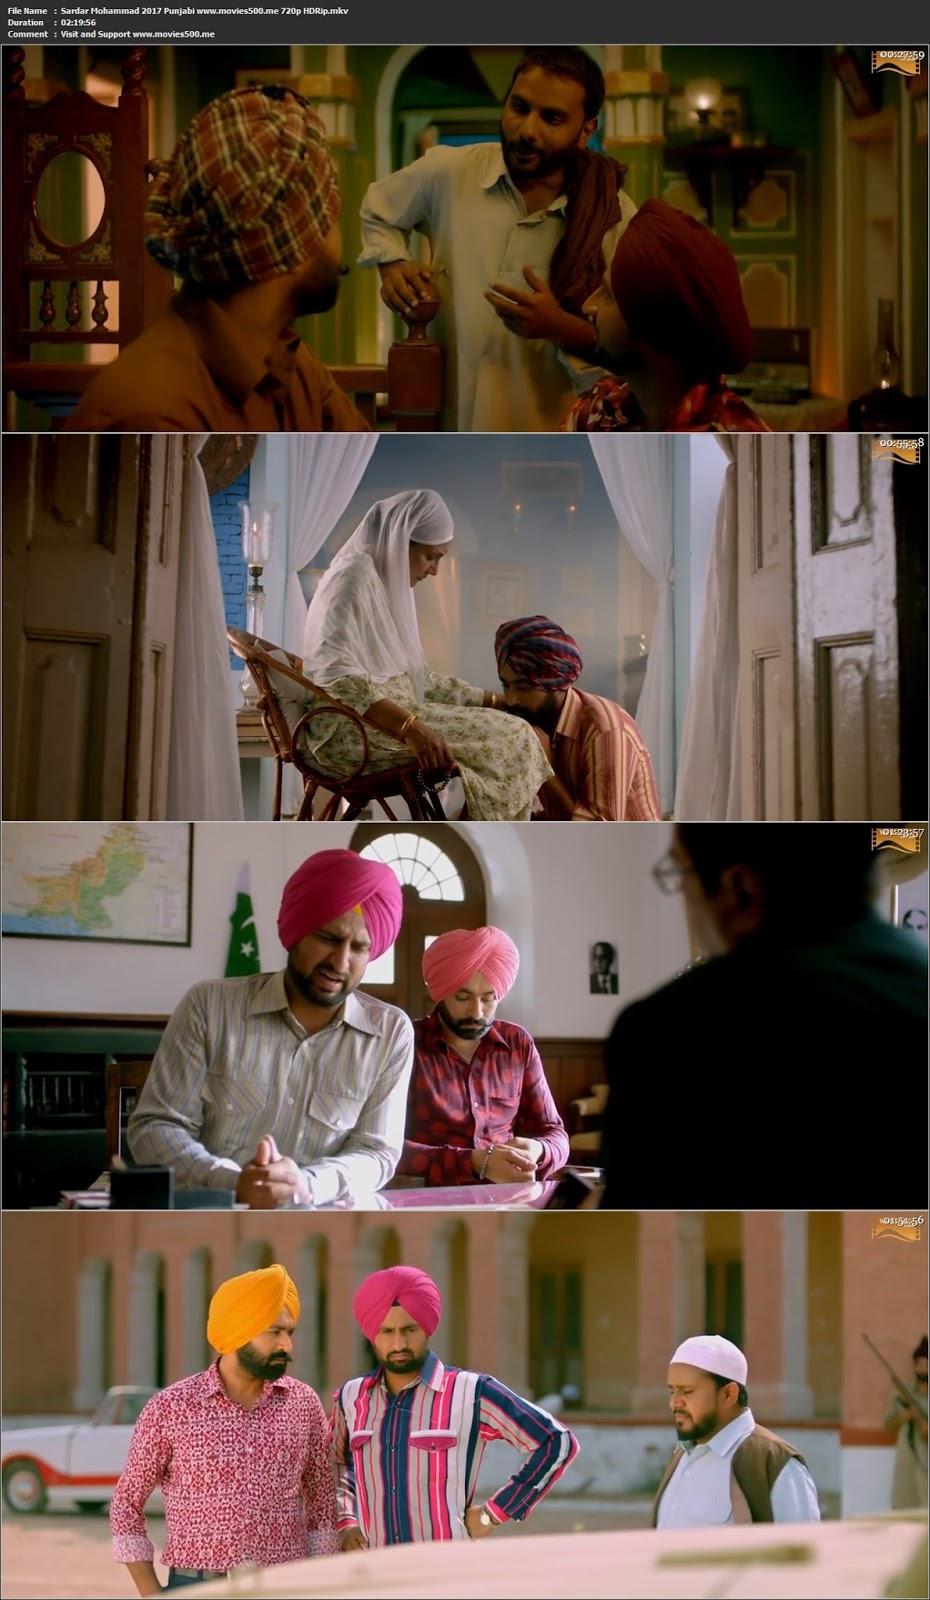 Sardar Mohammad 2017 Punjabi Full Movie HDRip 720p at s400.bet